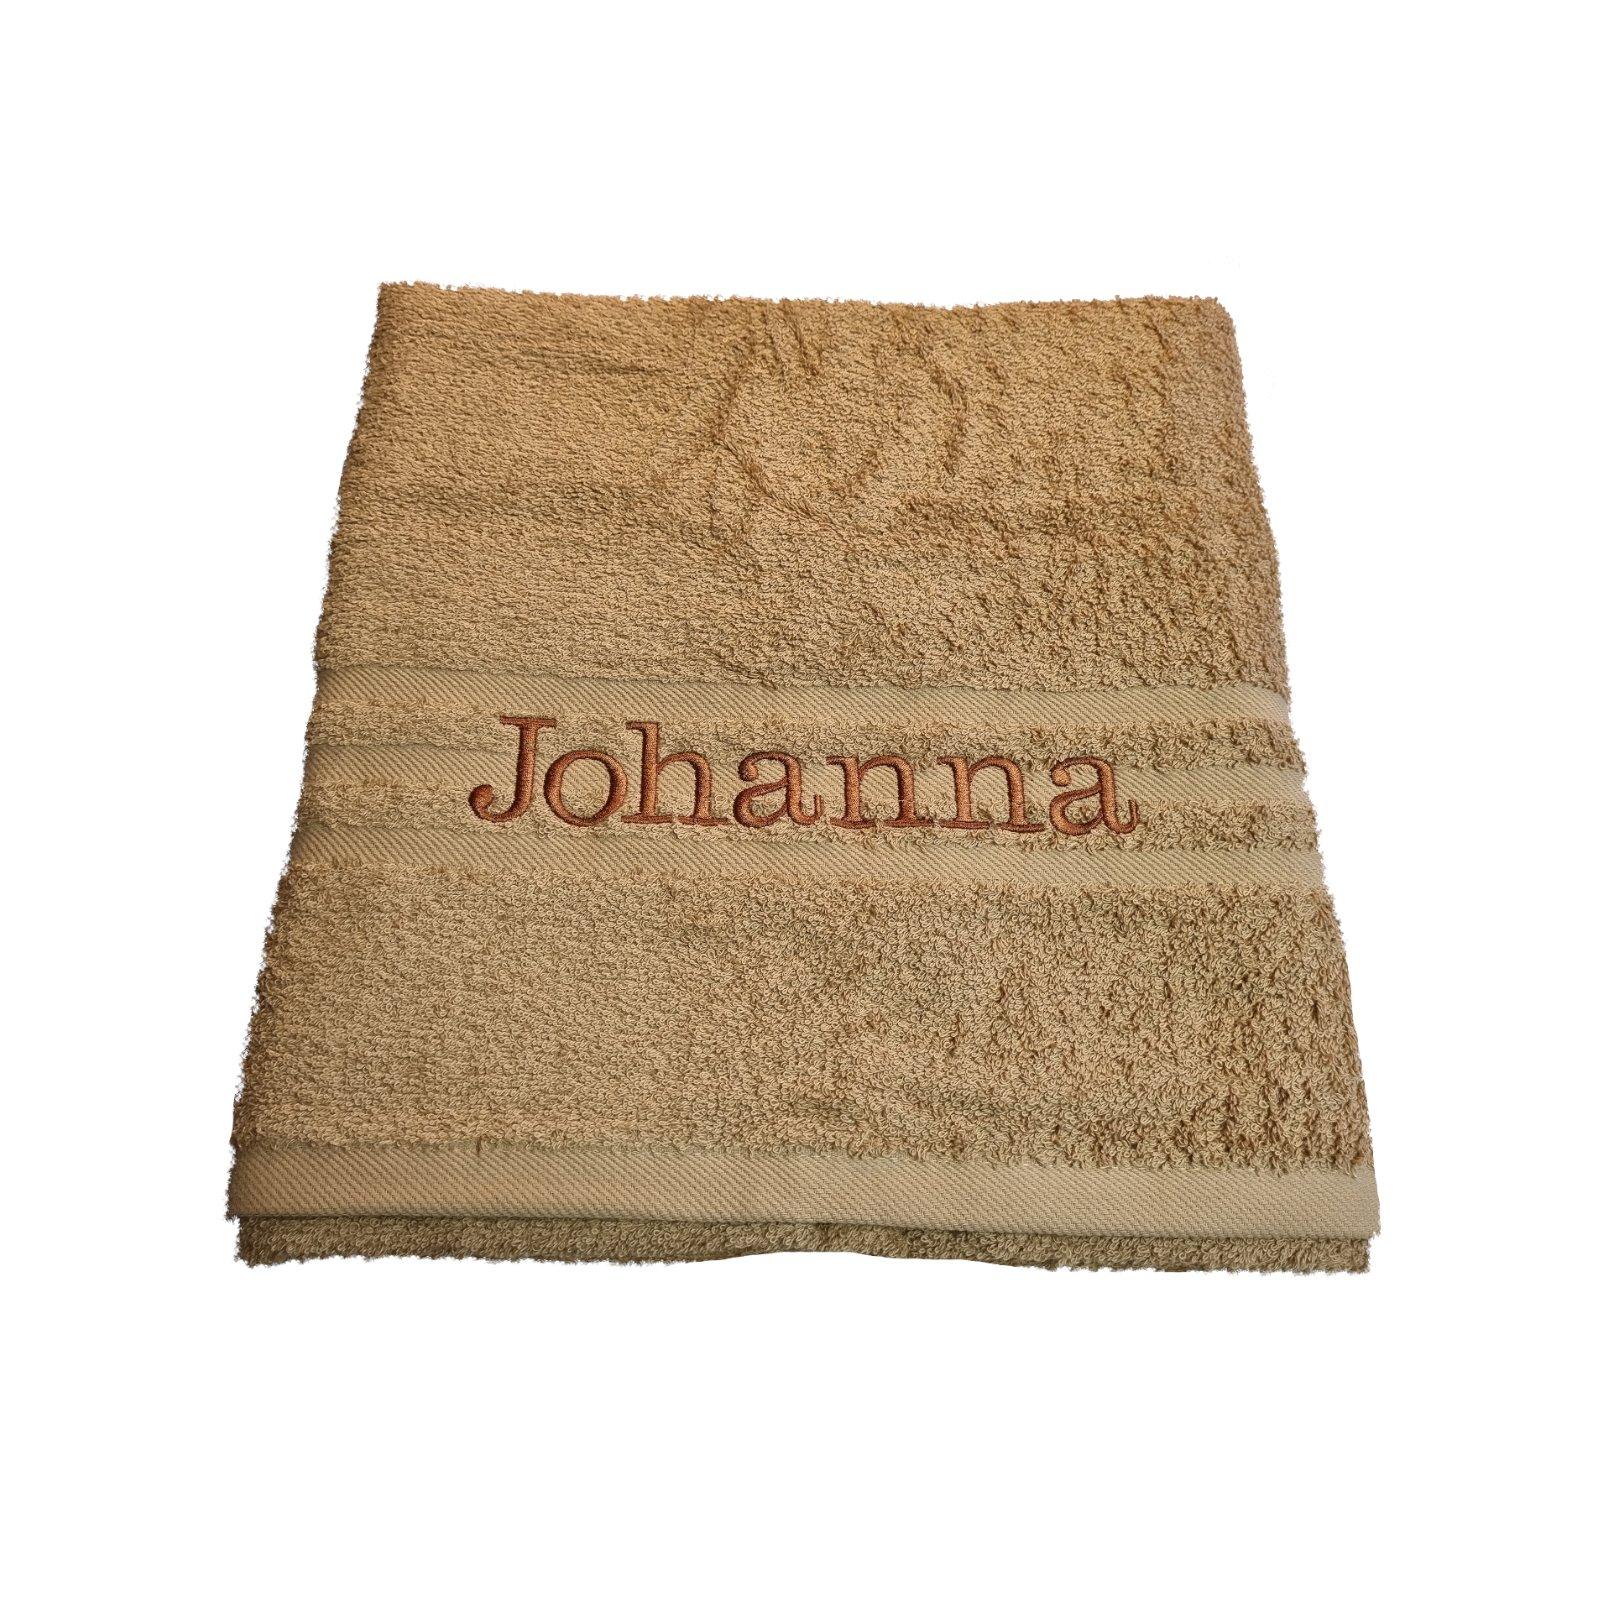 besticktes handtuch name